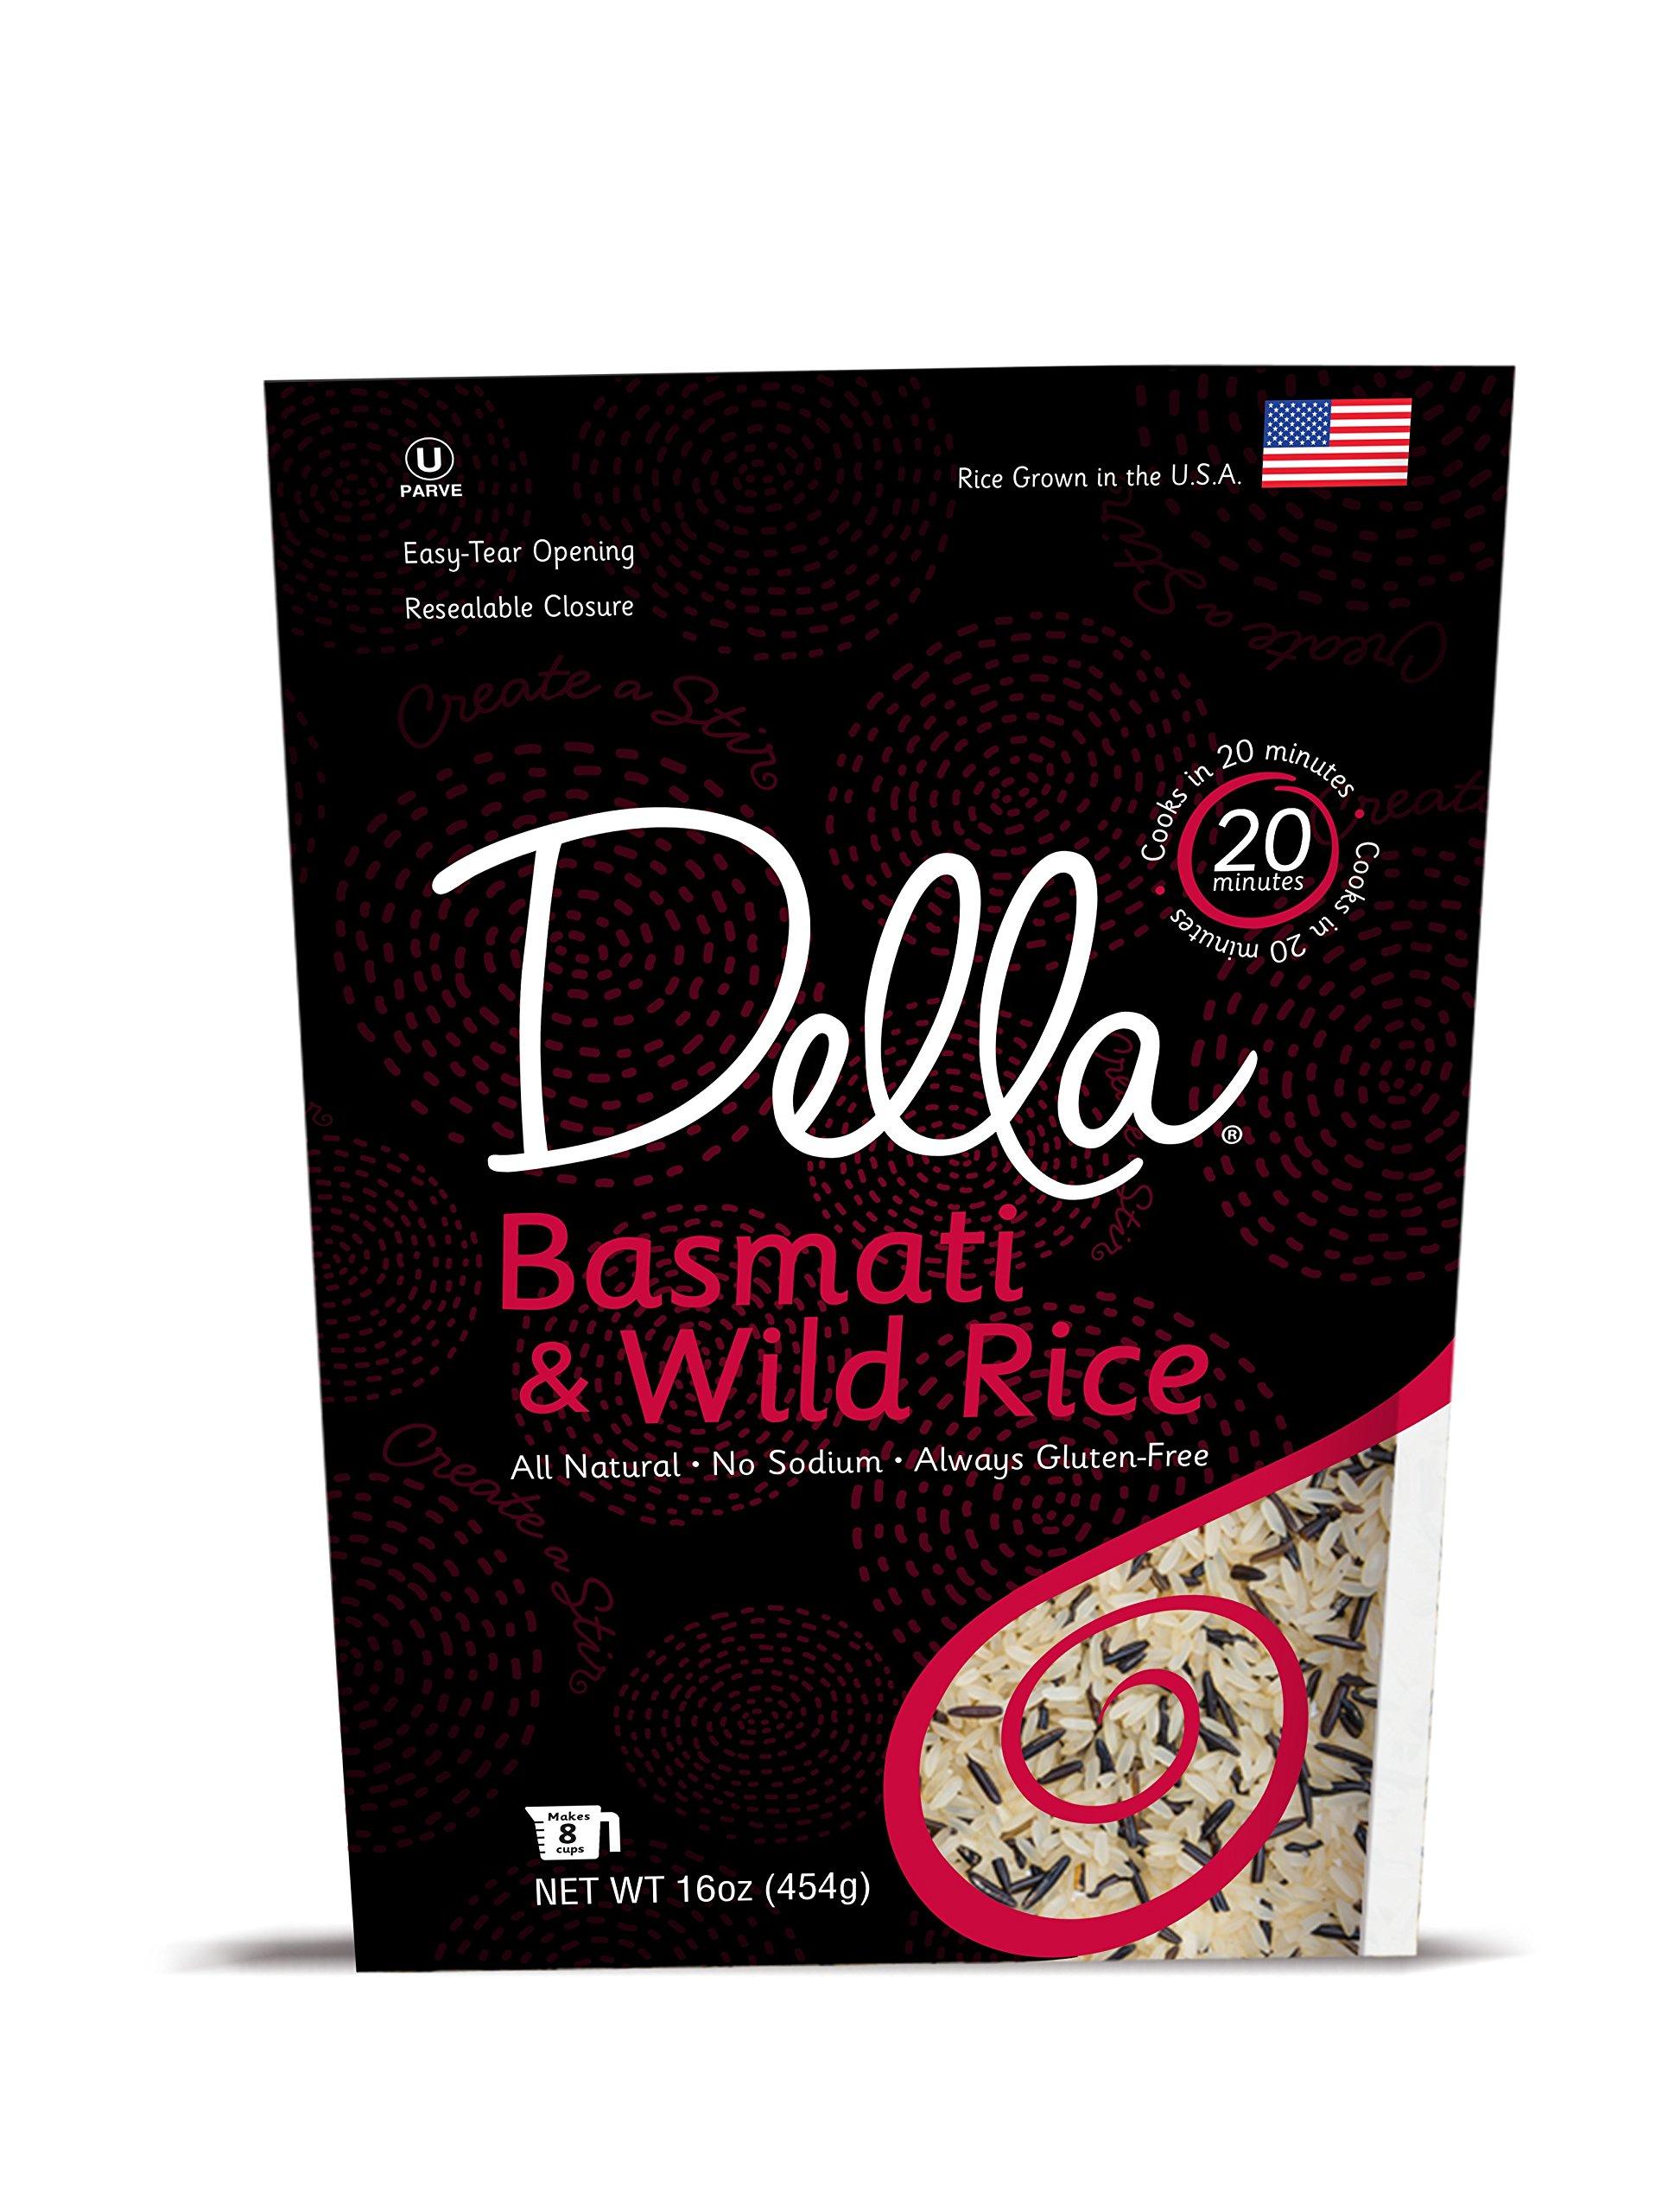 Della - Basmati and Wild Blend (16 Ounces, 8 Pack)